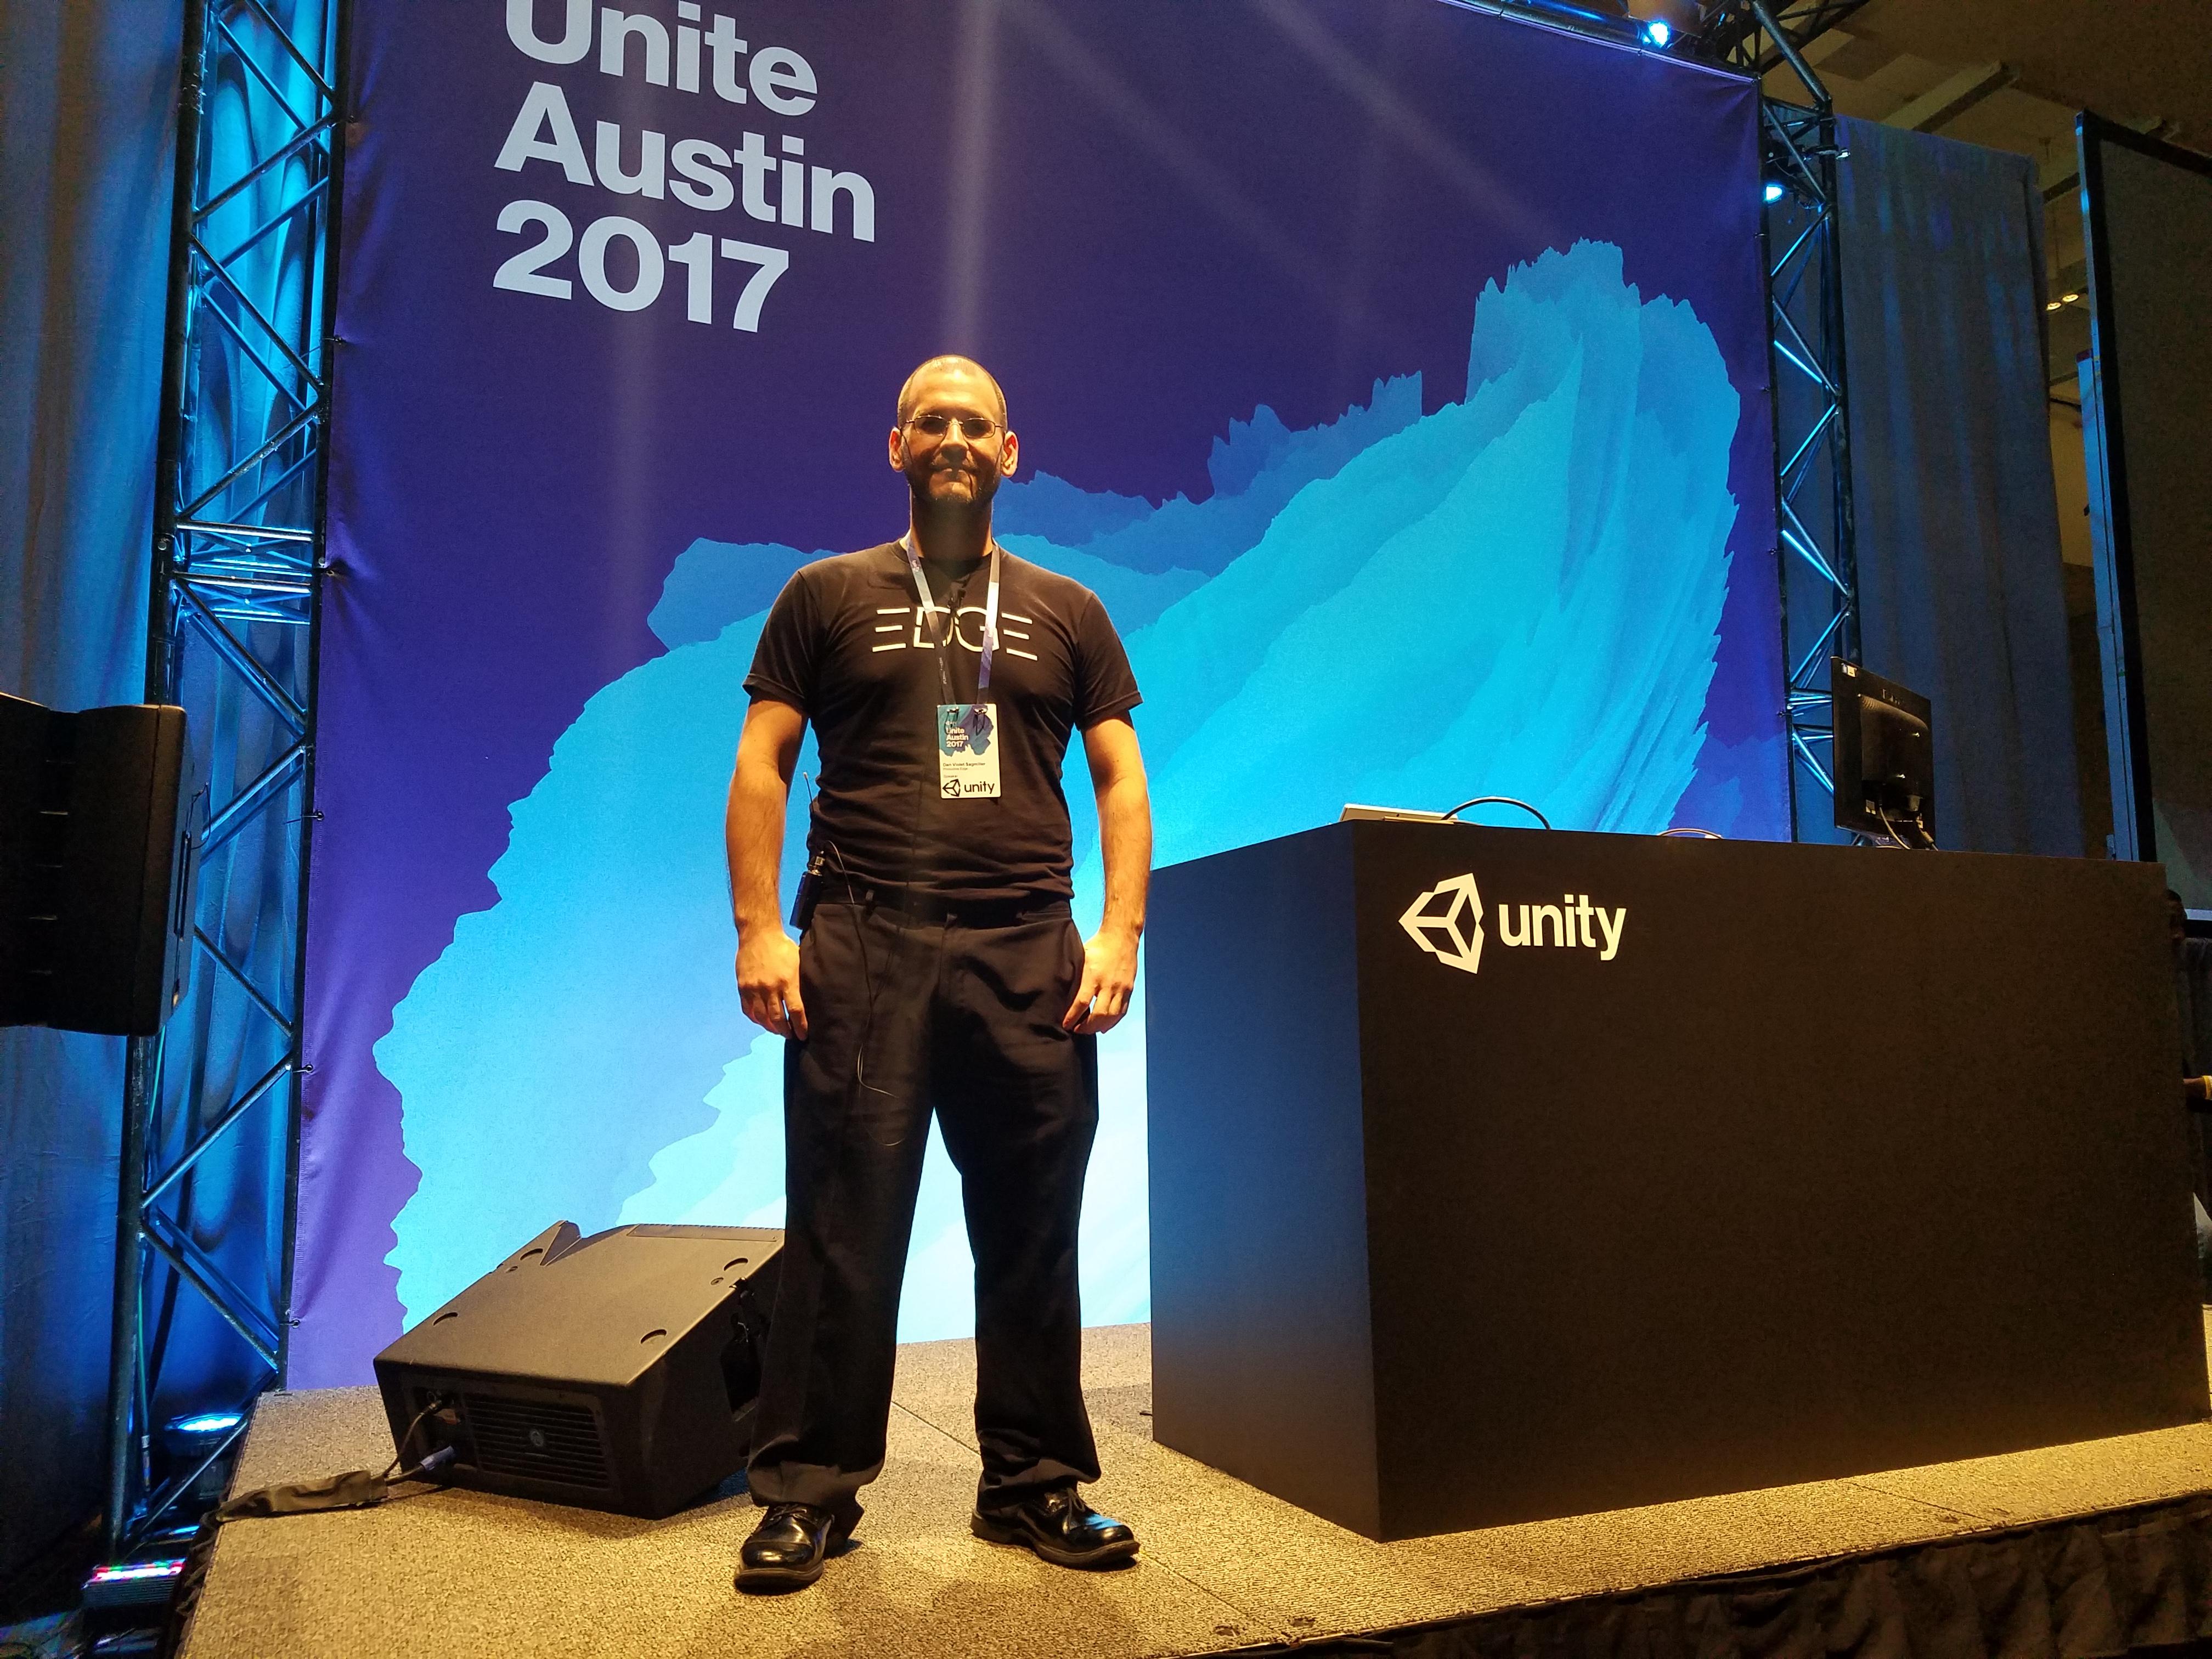 Unite Austin 2017 - SOLID Unity